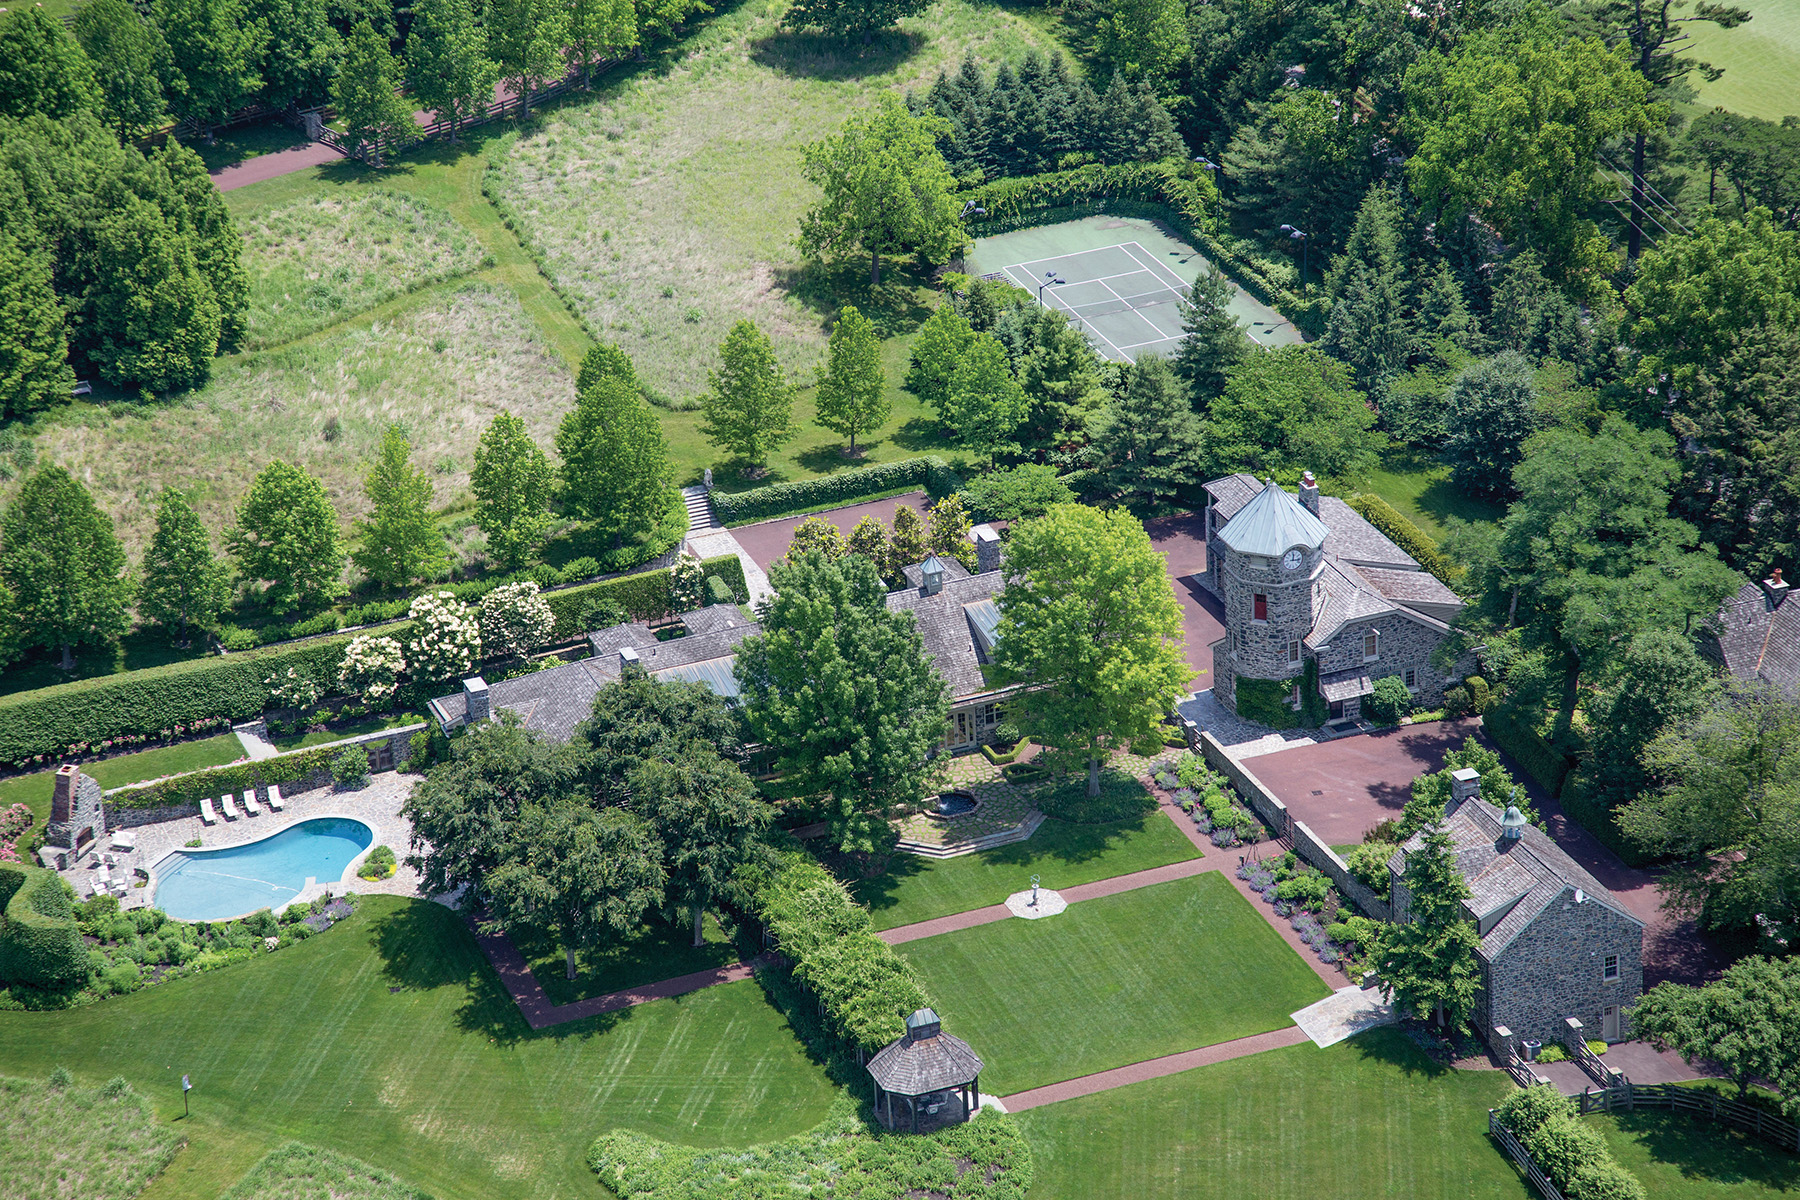 Single Family Home for Sale at Albermarle 770 Godfrey Rd. Villanova, Pennsylvania 19085 United States